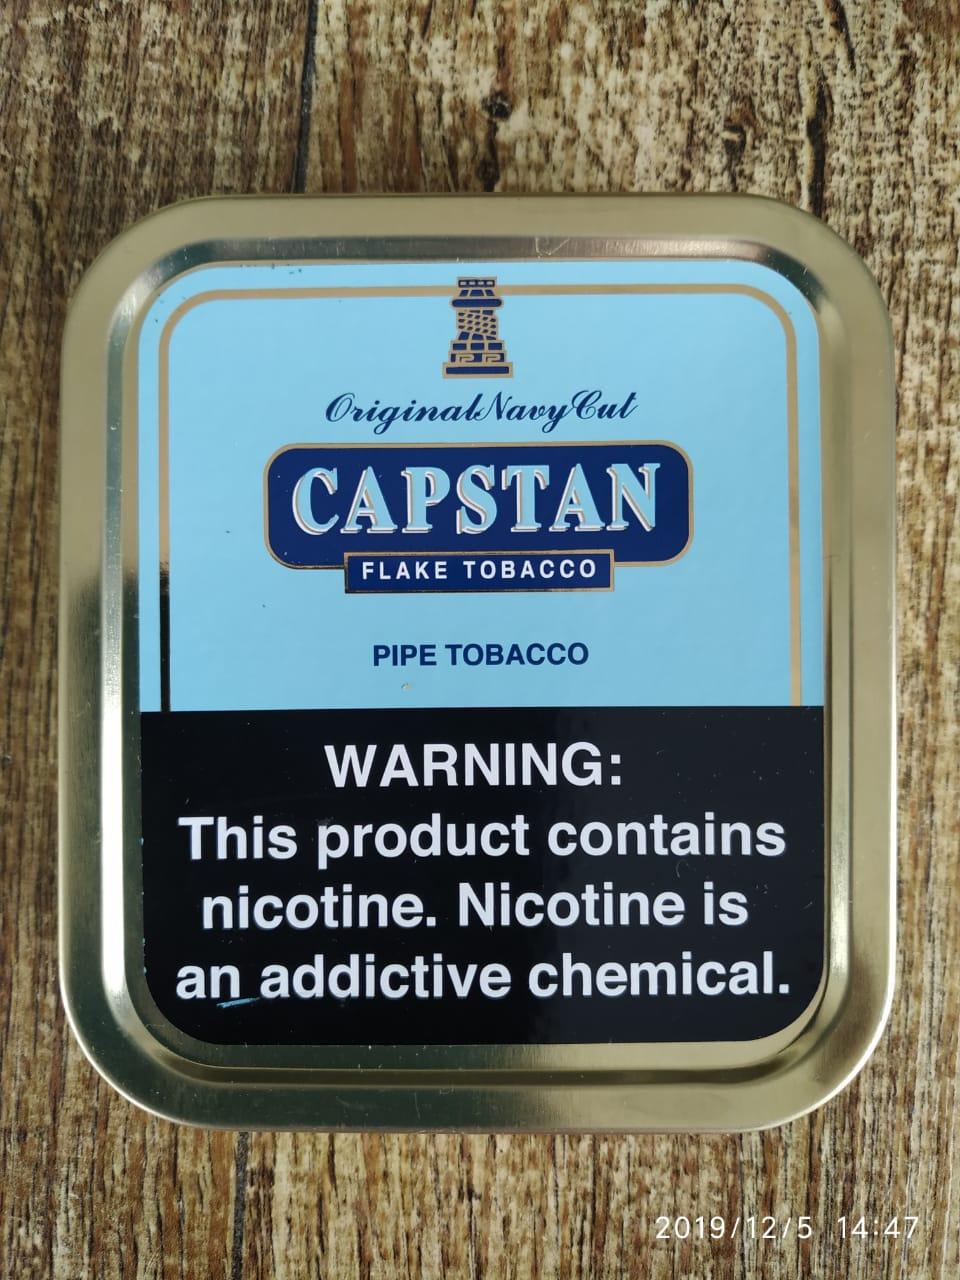 Mac Baren - Capstan Original Navy Cut